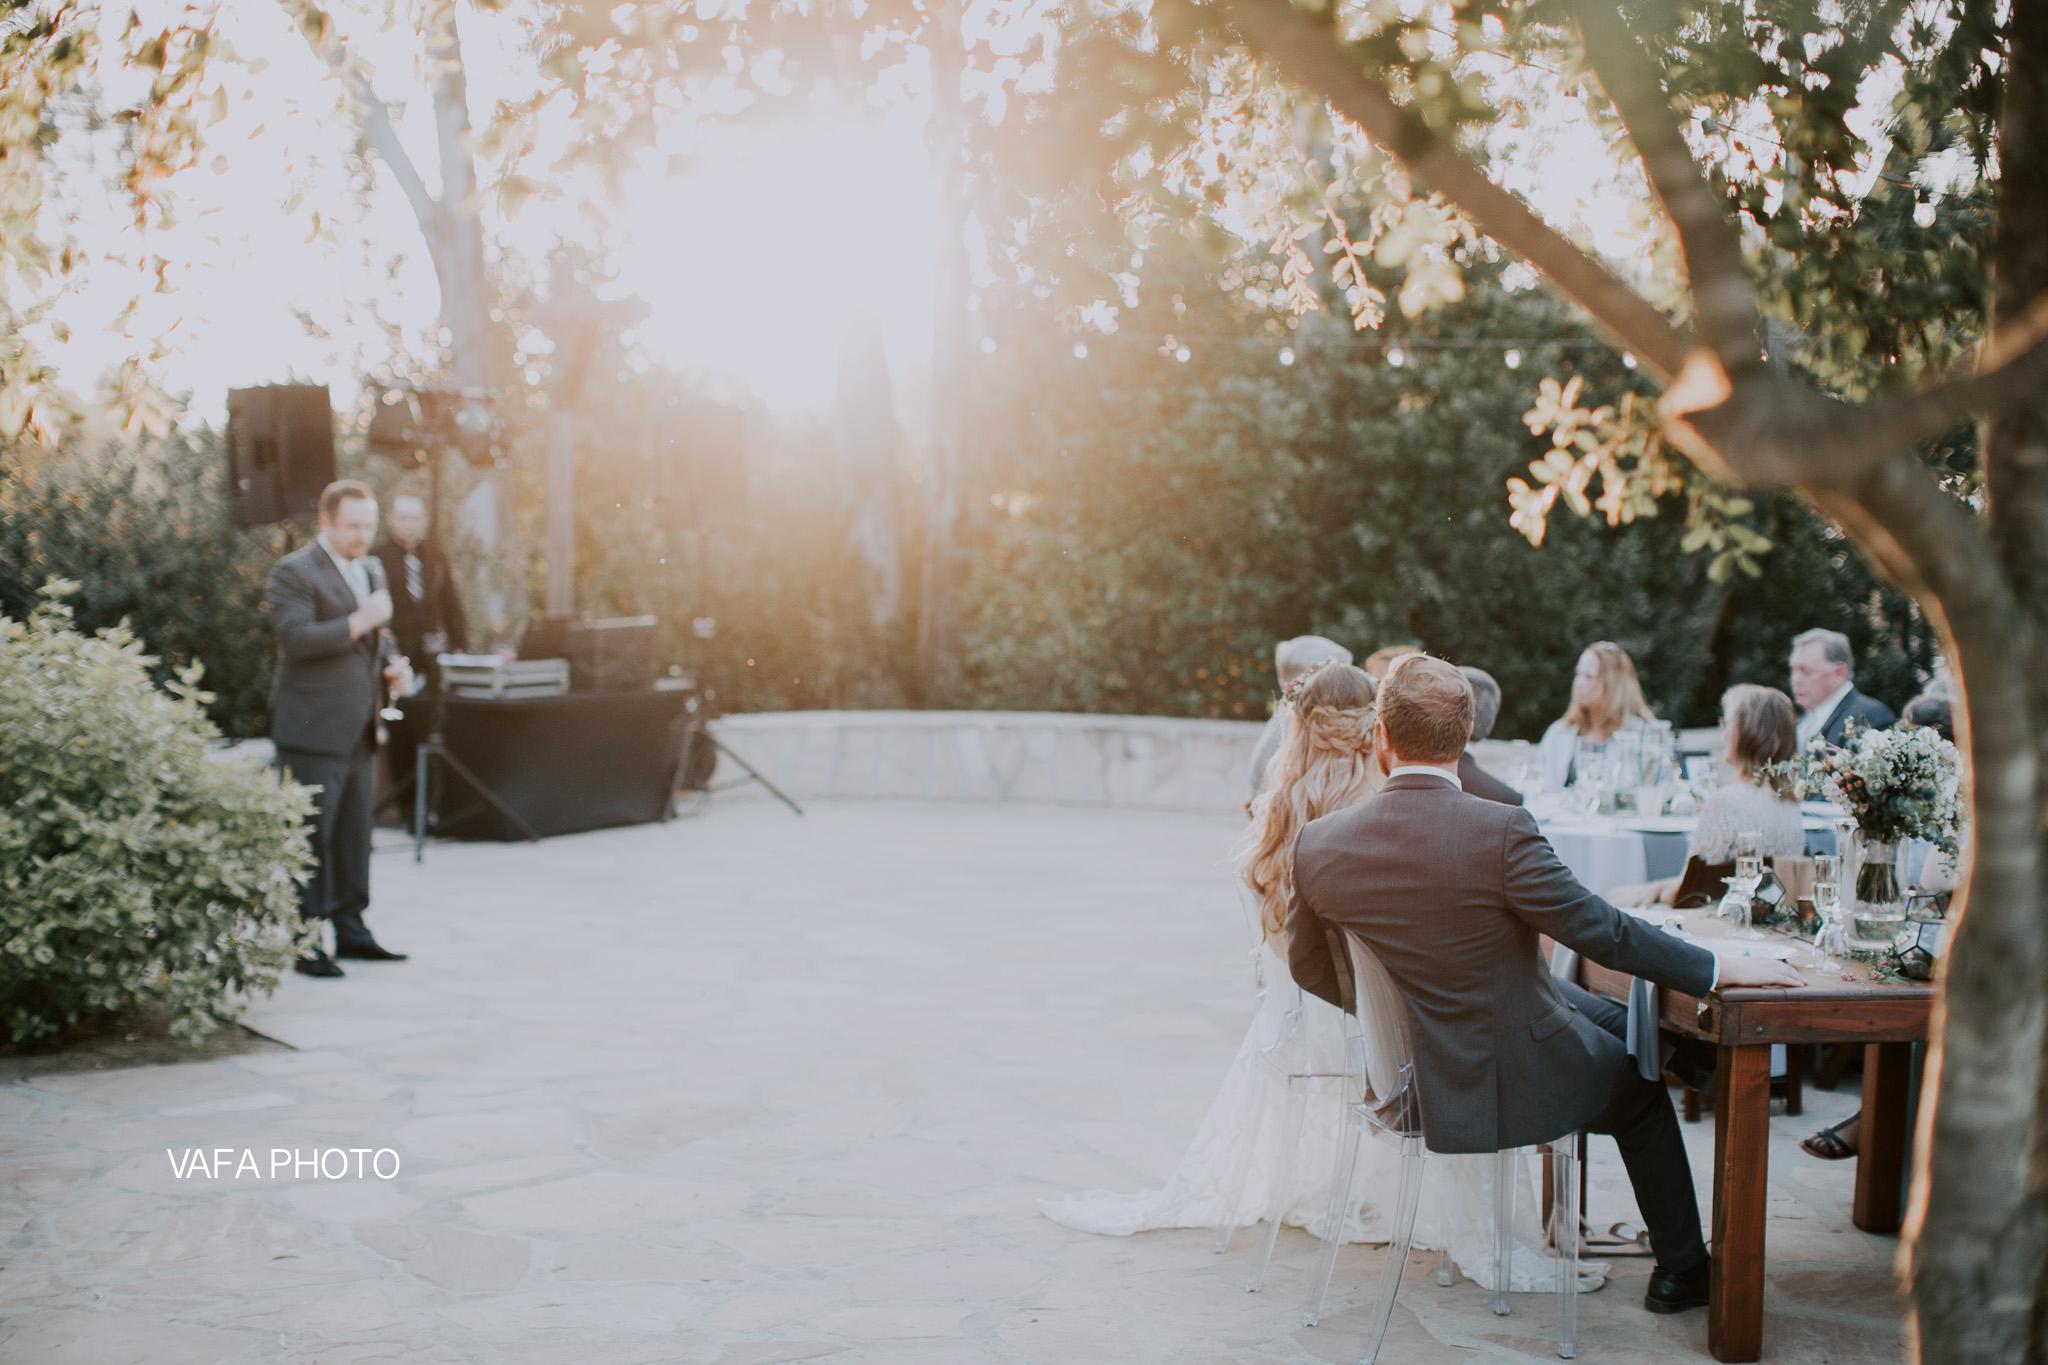 Leo-Carrillo-Ranch-Wedding-Lauren-Mike-Vafa-Photo-971.jpg